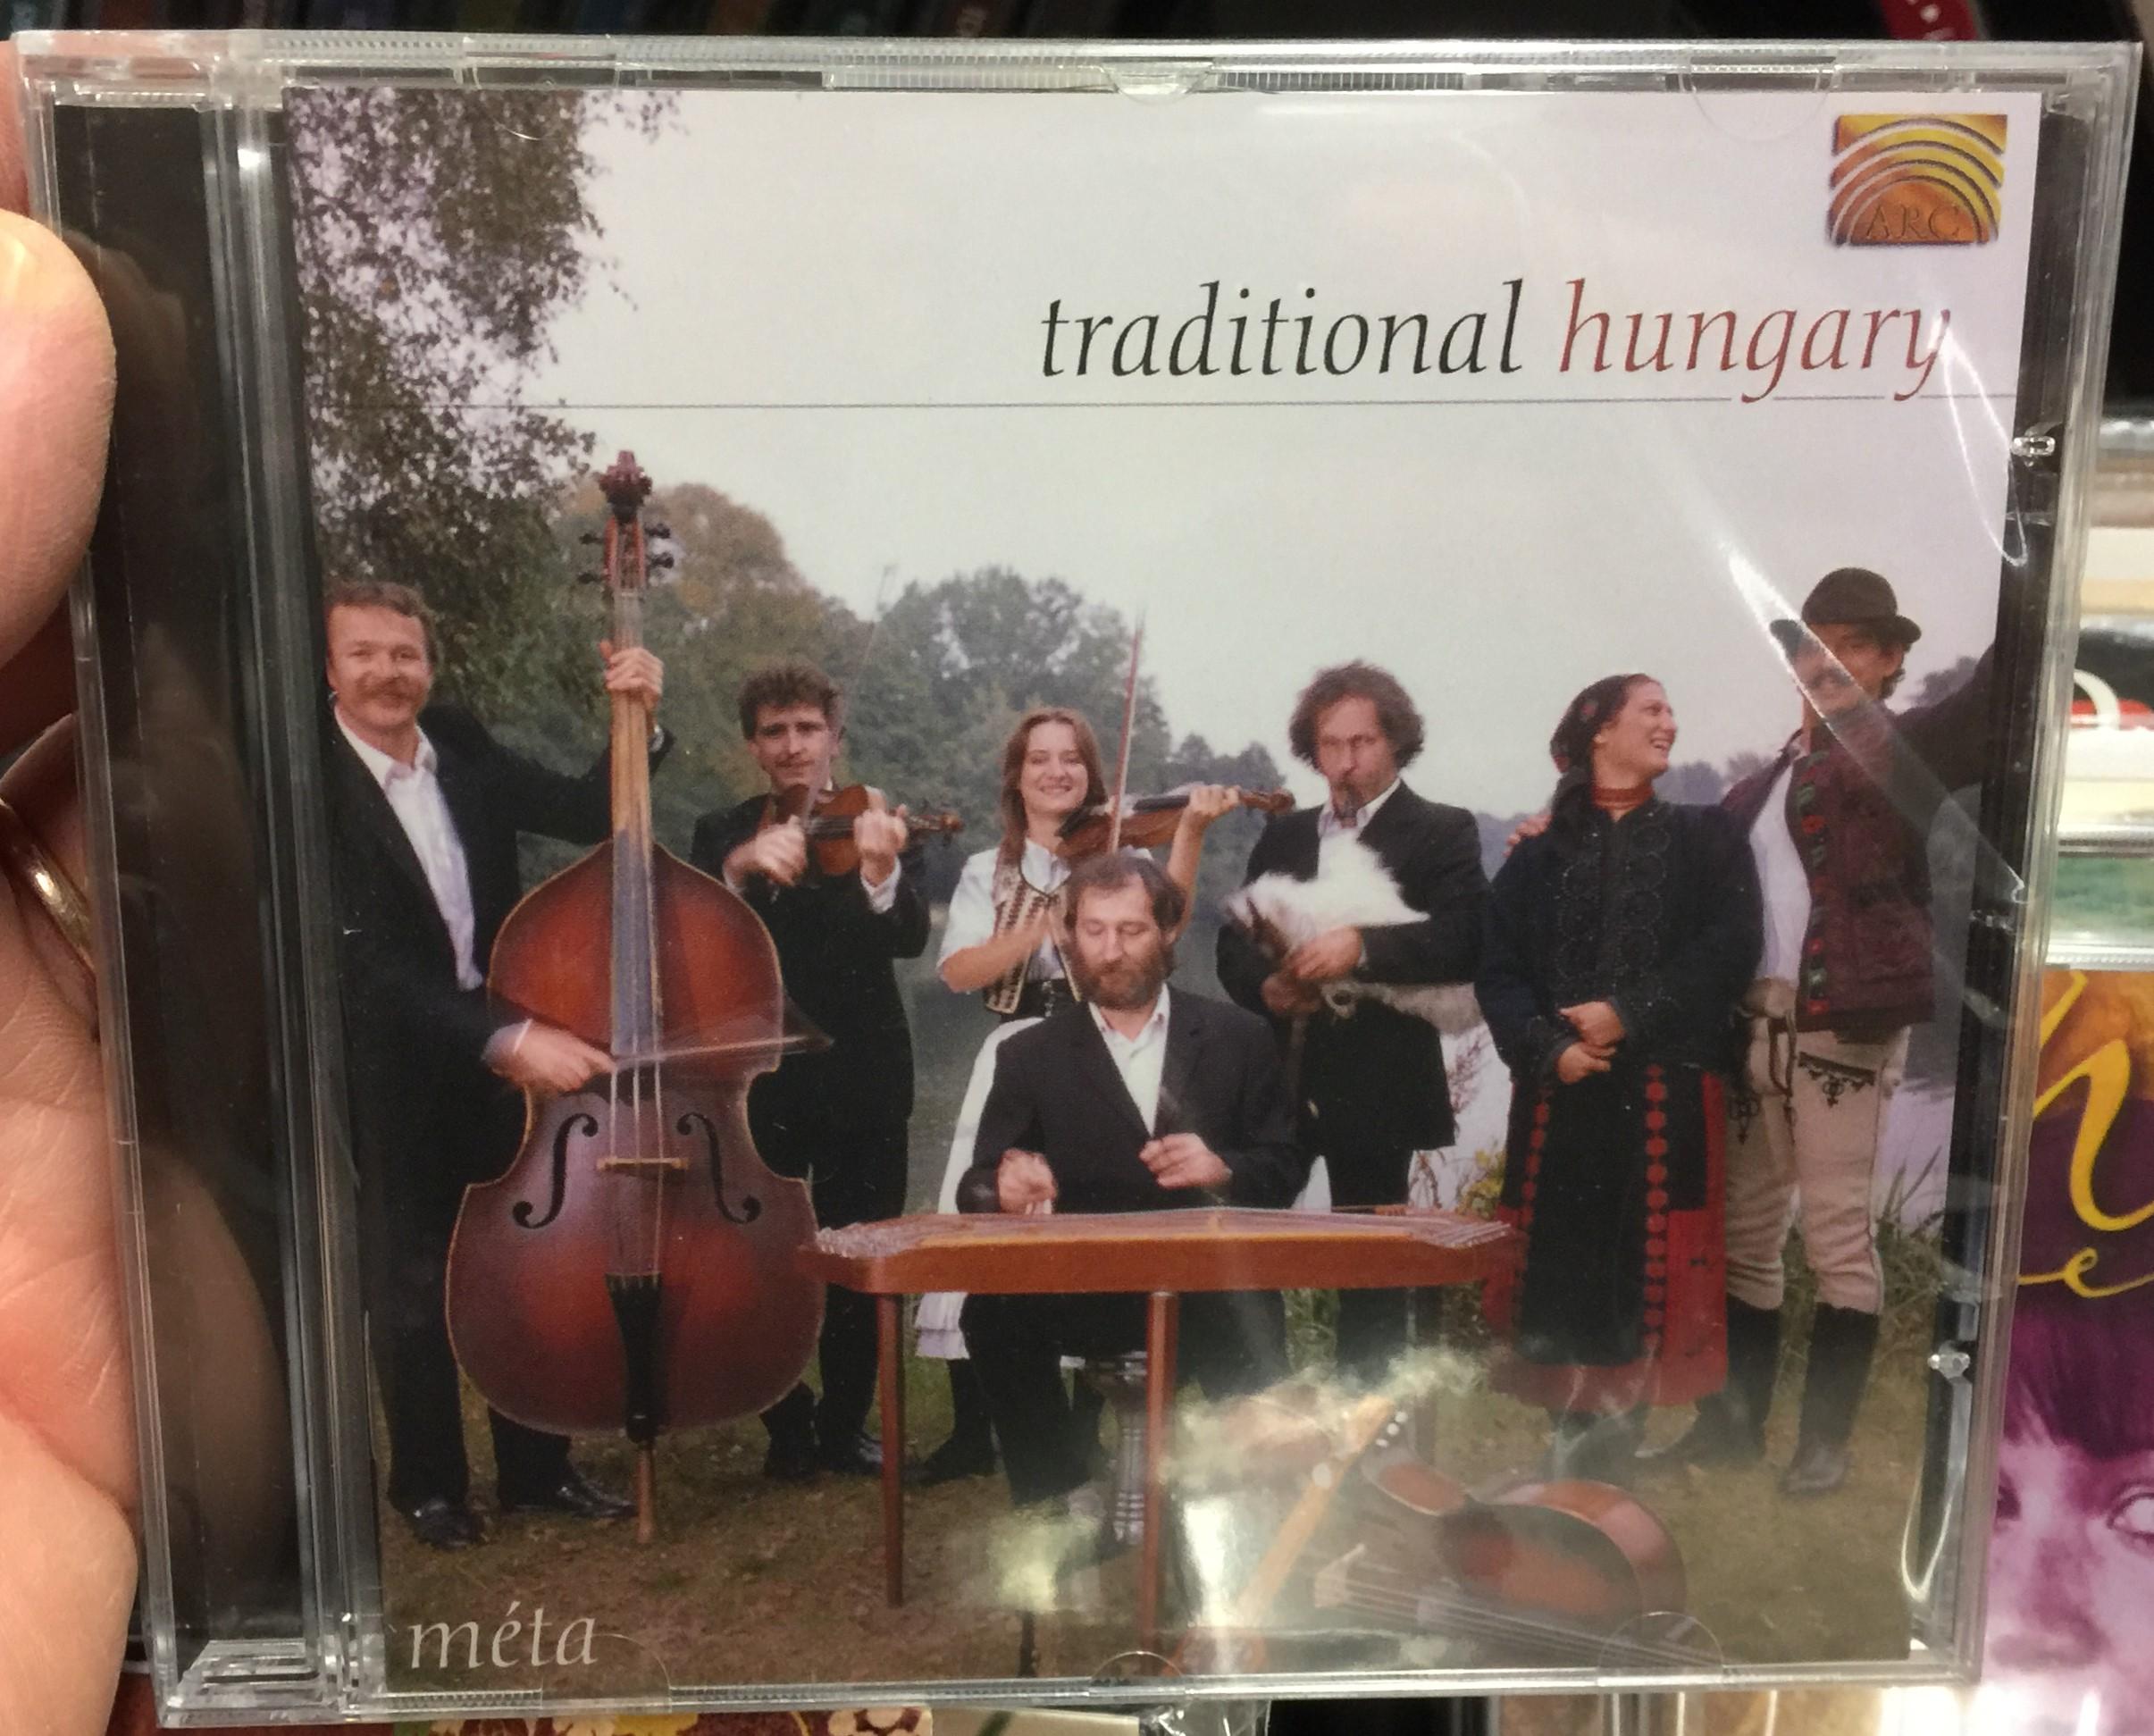 traditional-hungary-meta-audio-cd-eucd-1782-1-.jpg